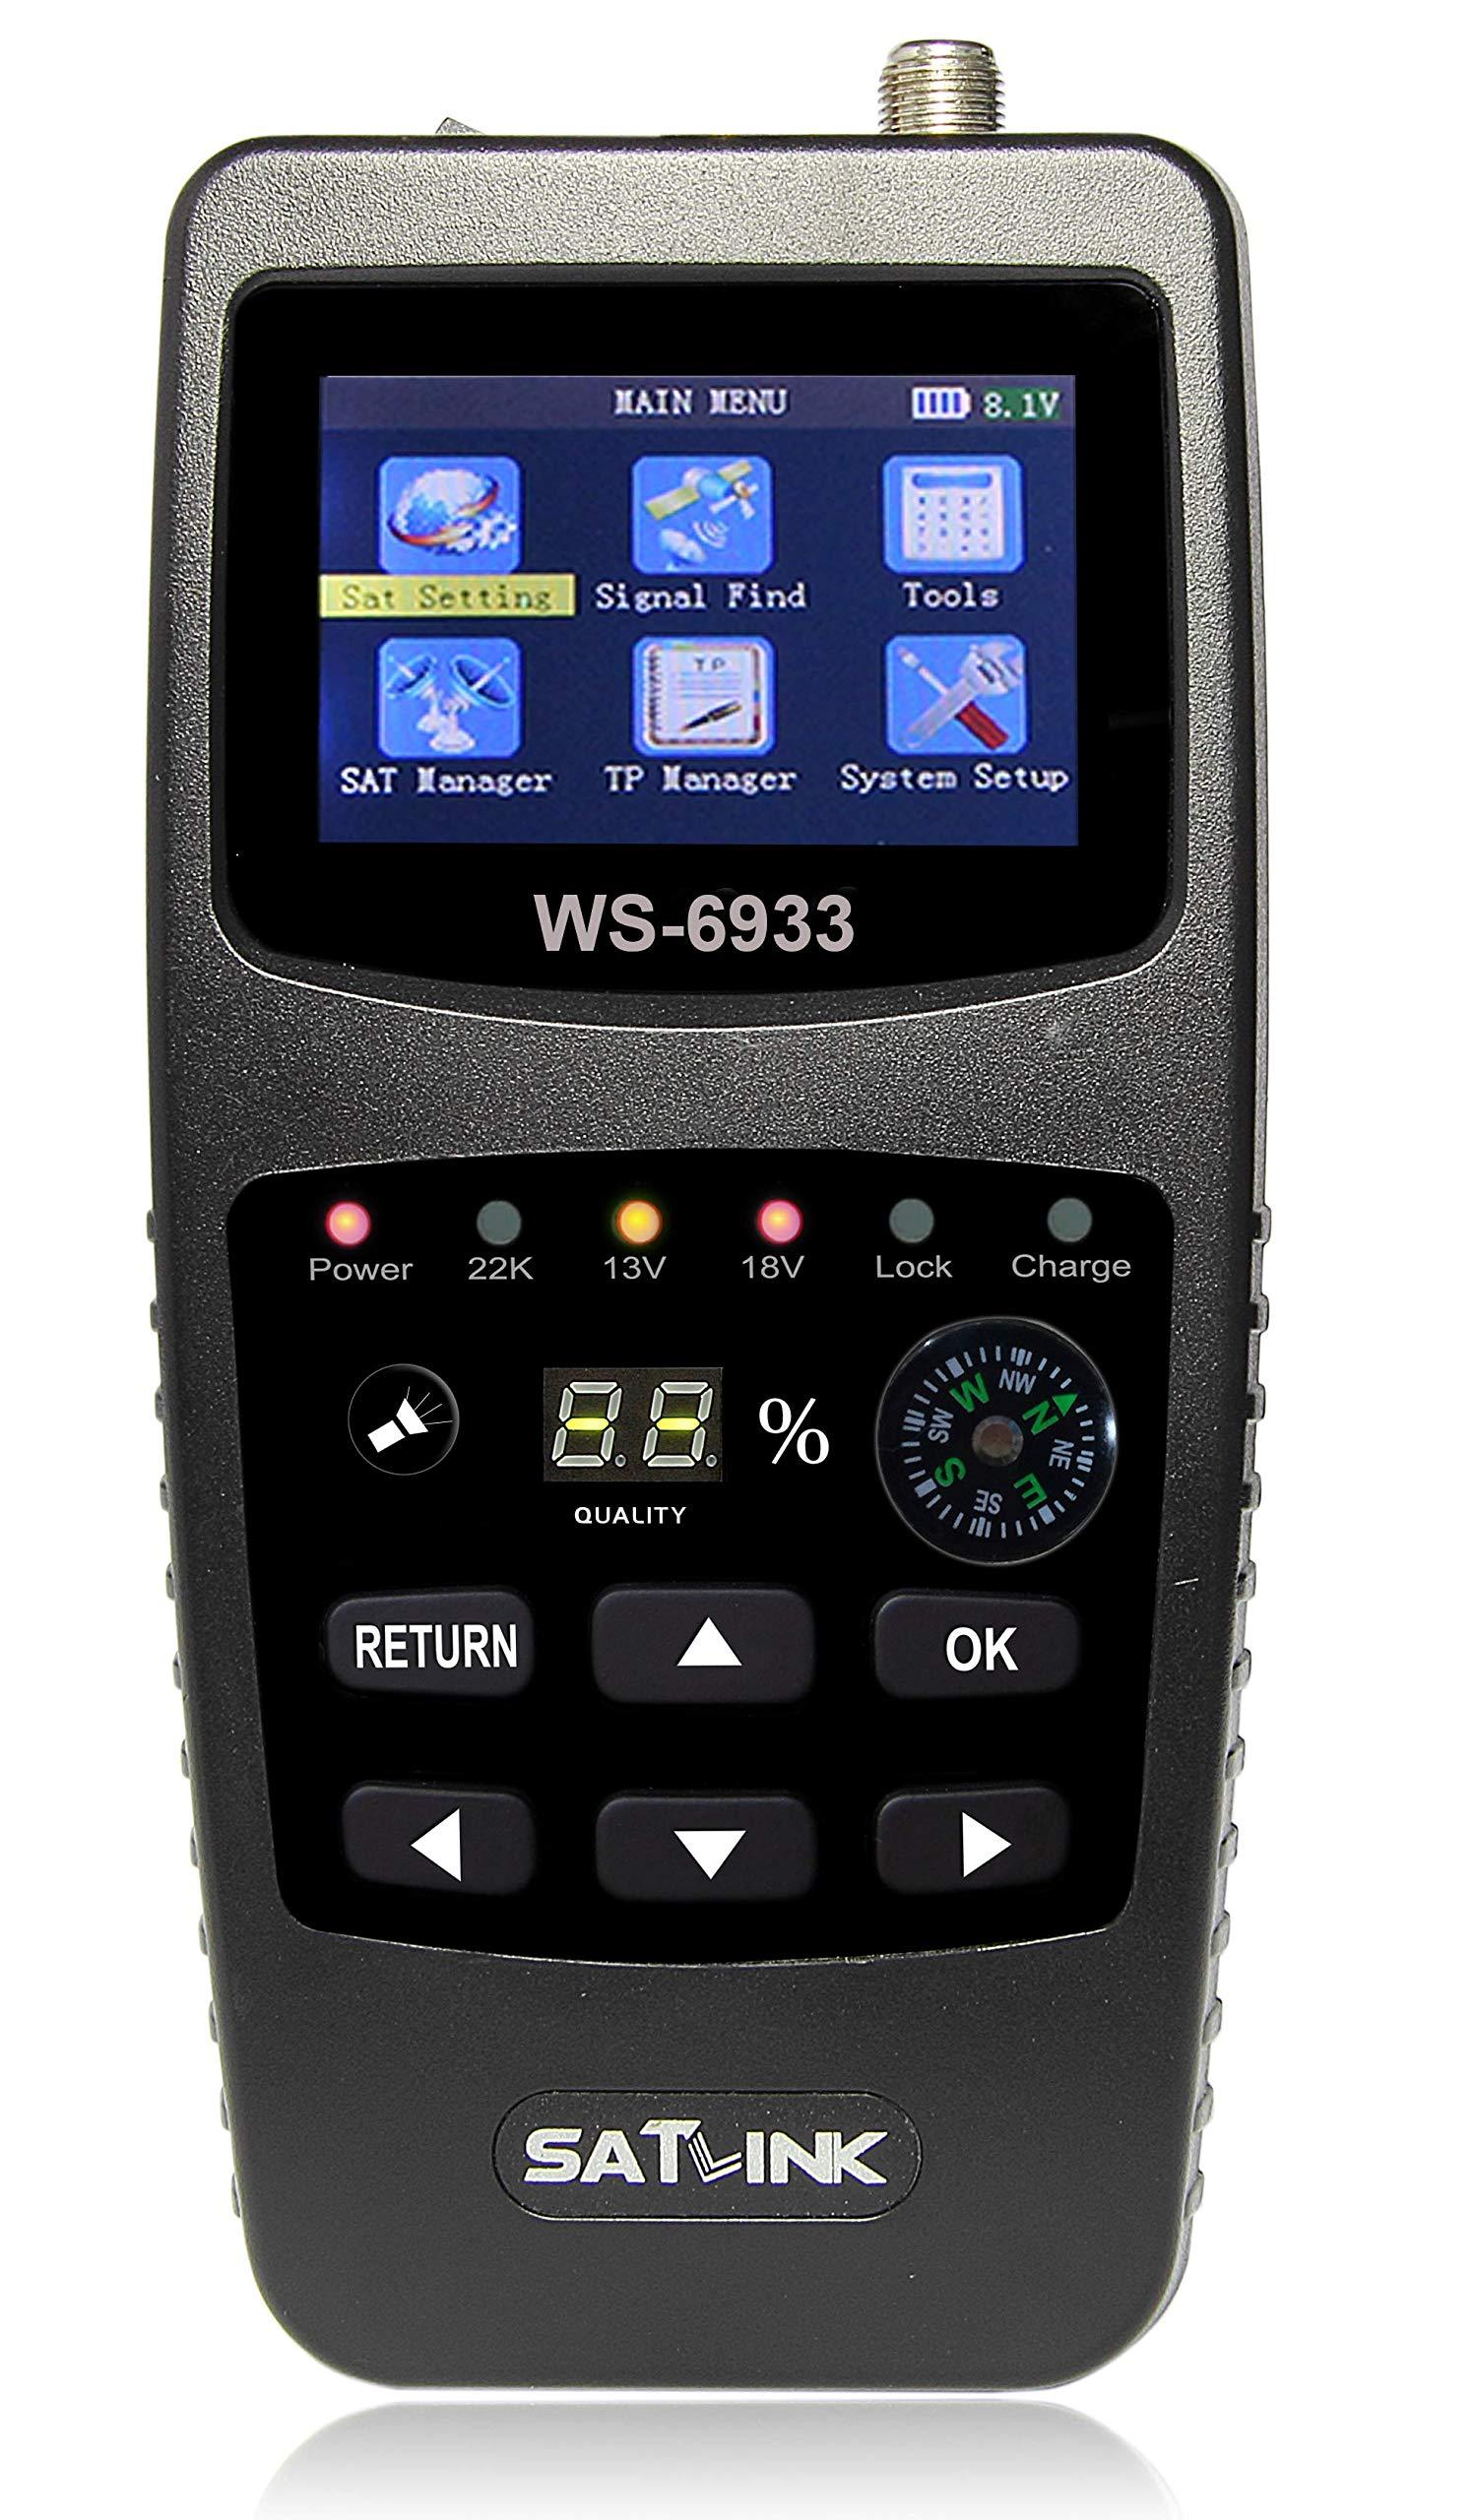 MeterTo Digital LCD Satellite Finder Compass Satellite Meter Detector WS-6933 DVB-S/S2 Compliant Terrestrial Signal Meter Receiver 950~2150MHz -65~-25dBm DISEQC 1.0/1.1,0/22khz USB by MeterTo